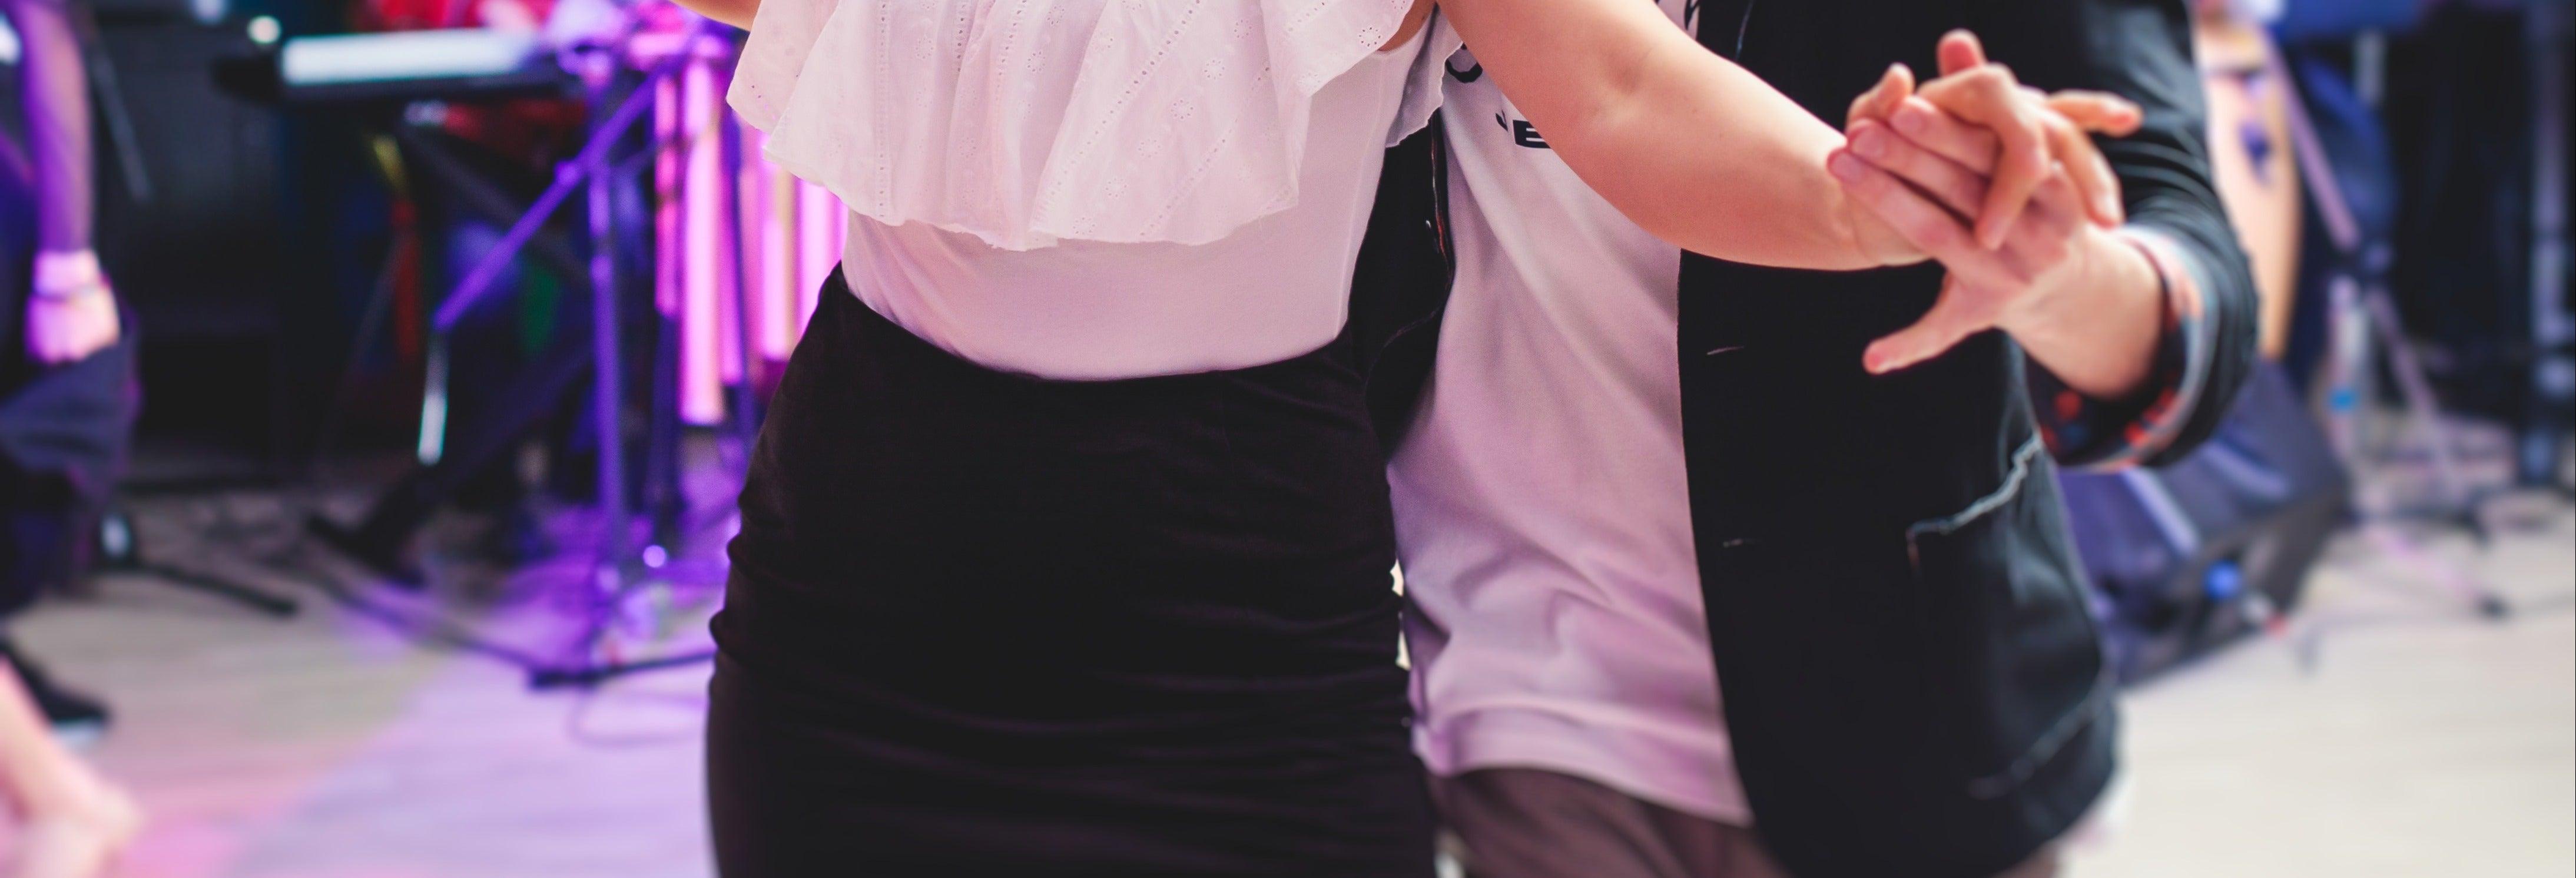 Experiencia de tango en Buenos Aires